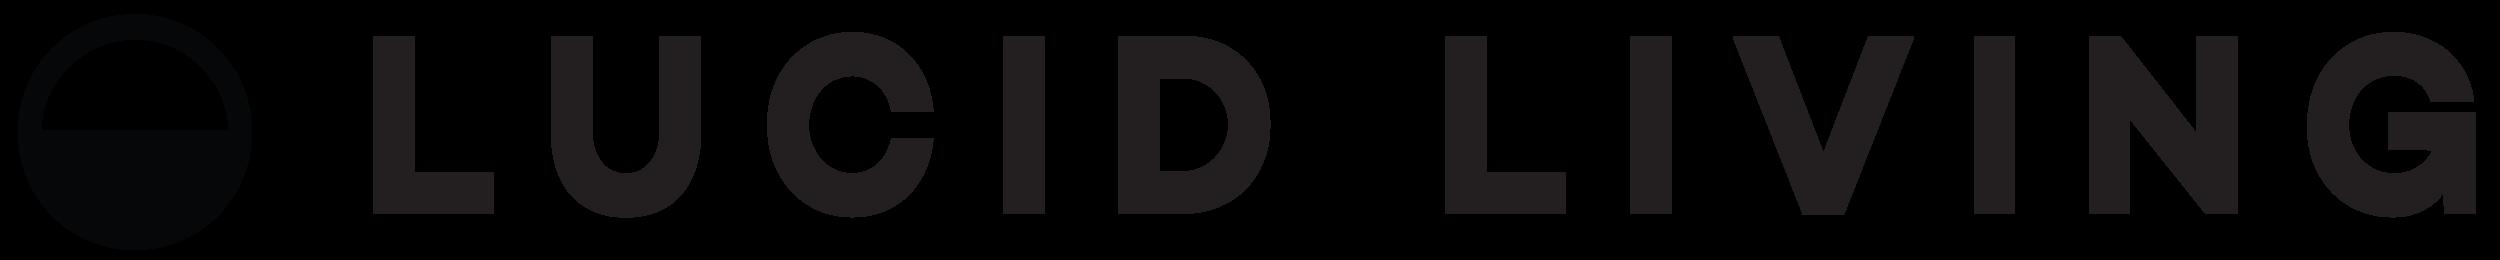 LL_horizontal-logo.png